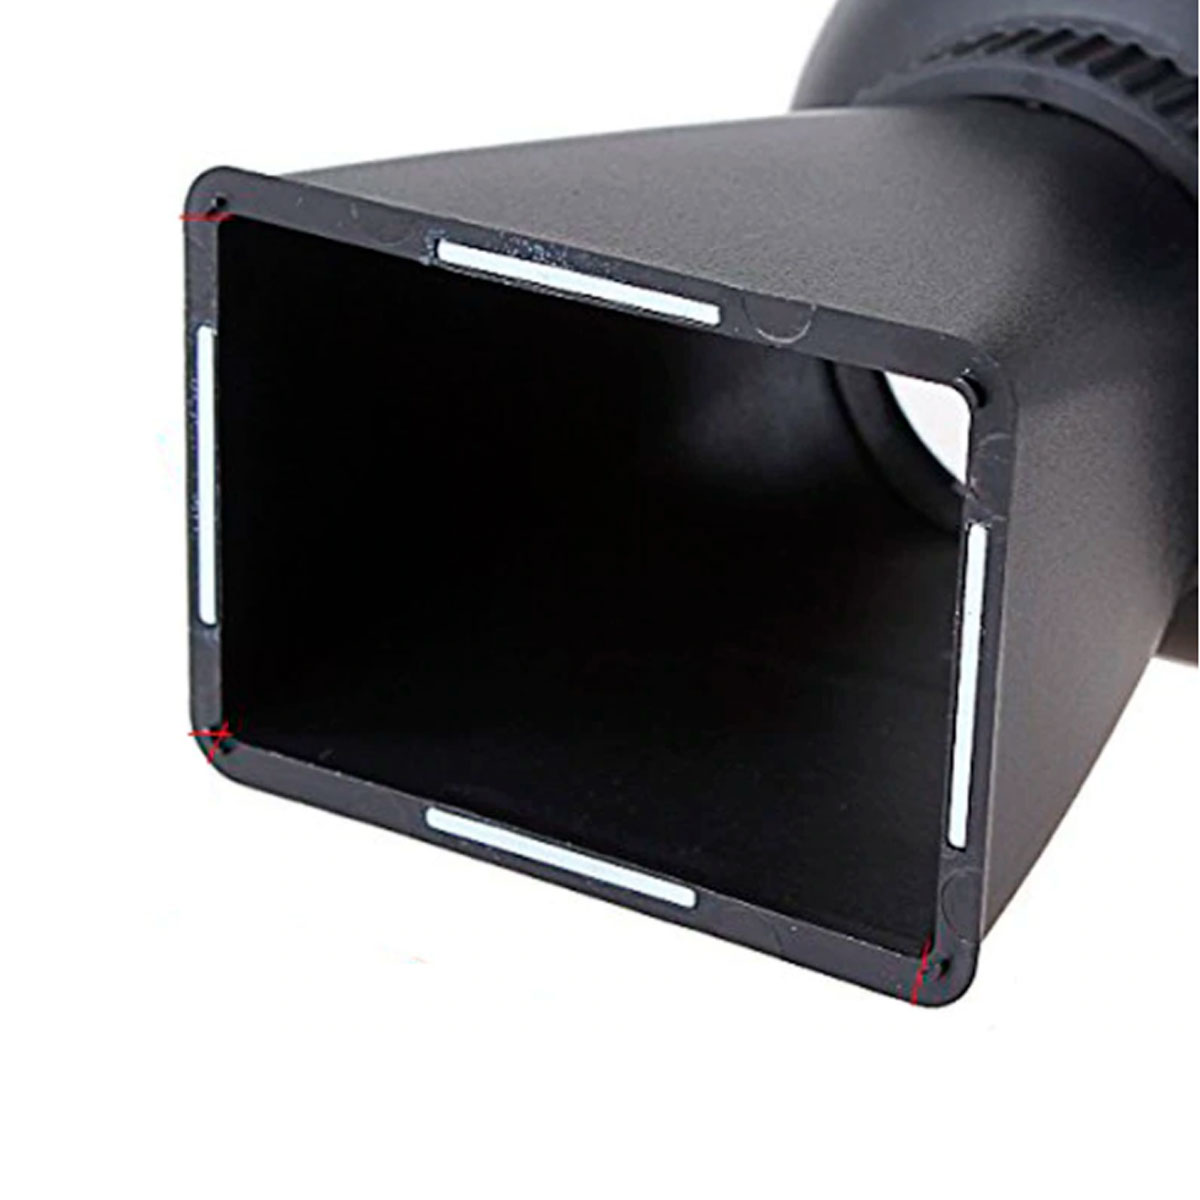 Visor LCD Viewfinder Câmera V3 - Canon 600D/60D